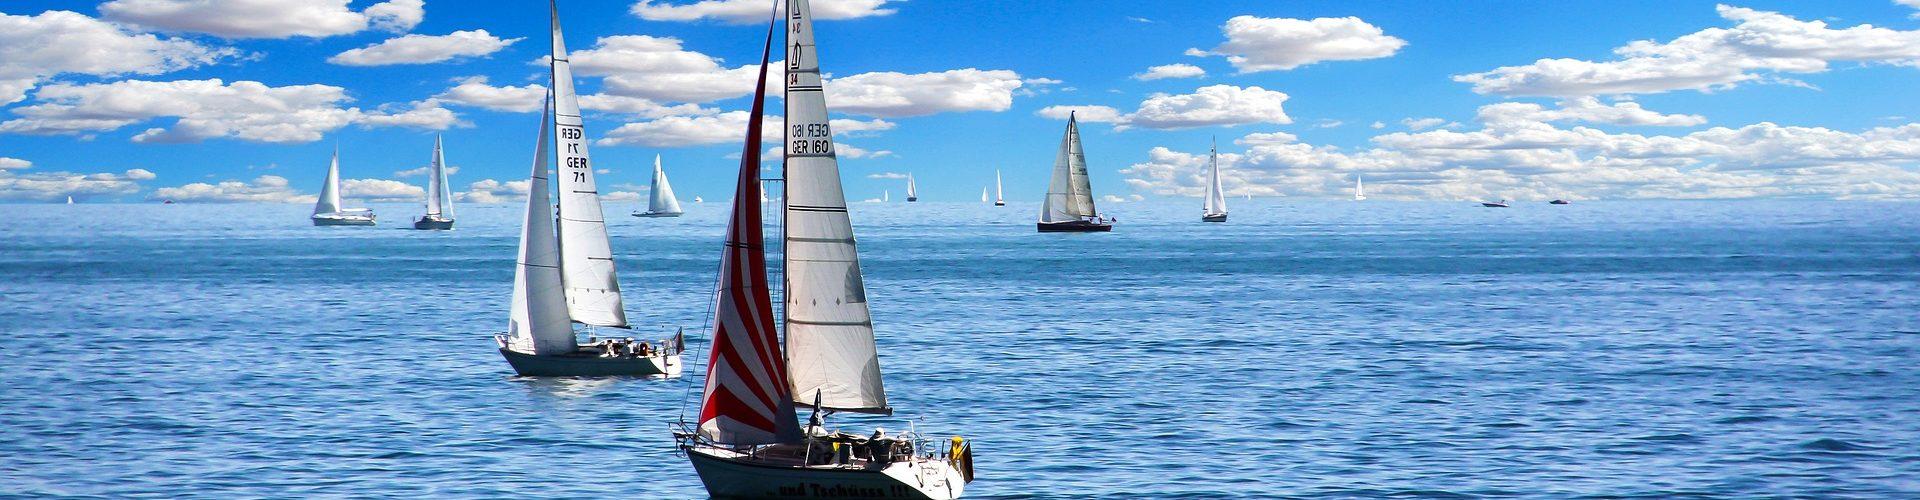 segeln lernen in Villingen Schwenningen segelschein machen in Villingen Schwenningen 1920x500 - Segeln lernen in Villingen-Schwenningen